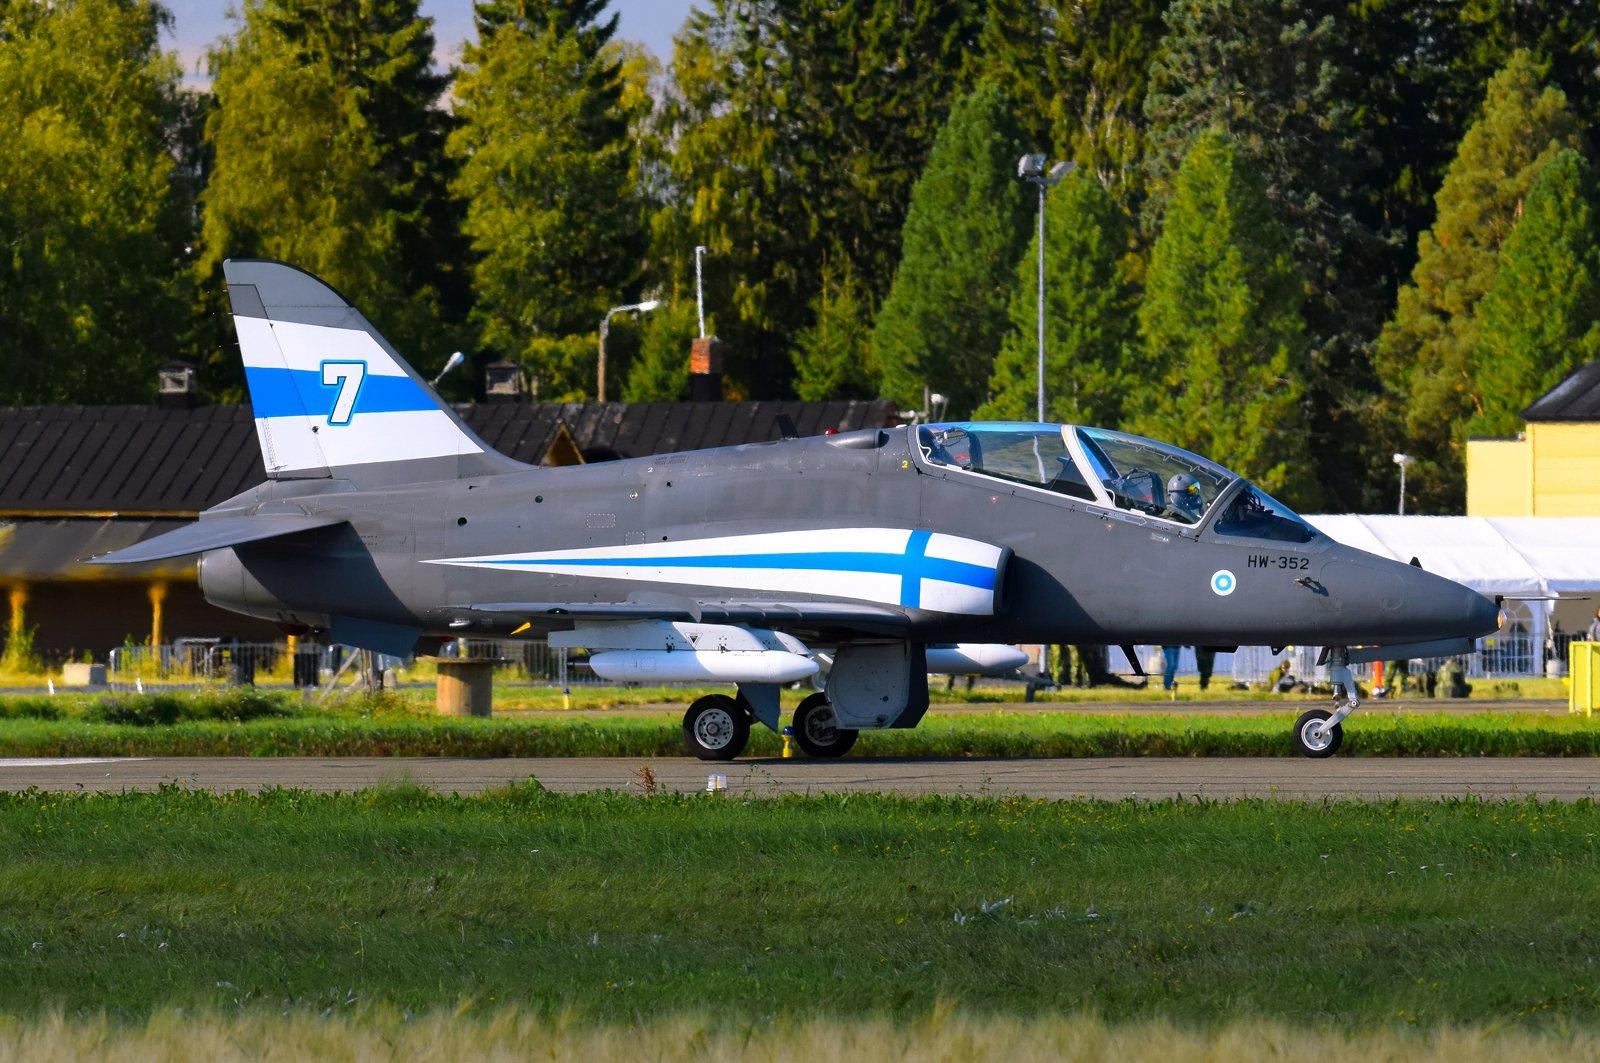 HW-352 - British Aerospace Hawk Mk.51A - Ilmavoimat - 31.8.2020